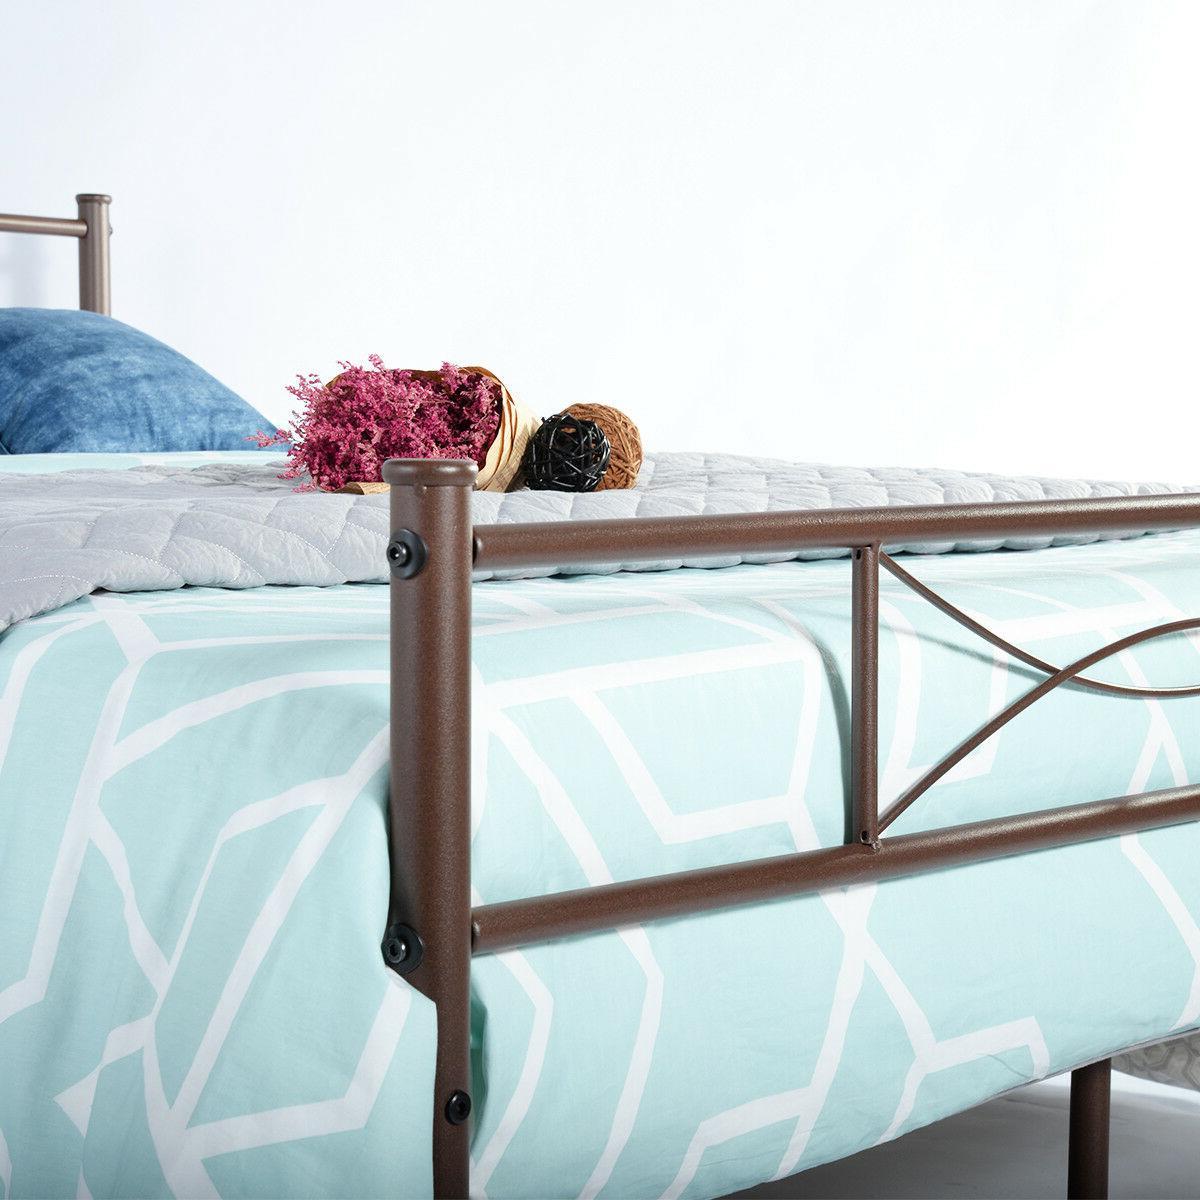 Metal Full Bed Frame Headboard and Footboard